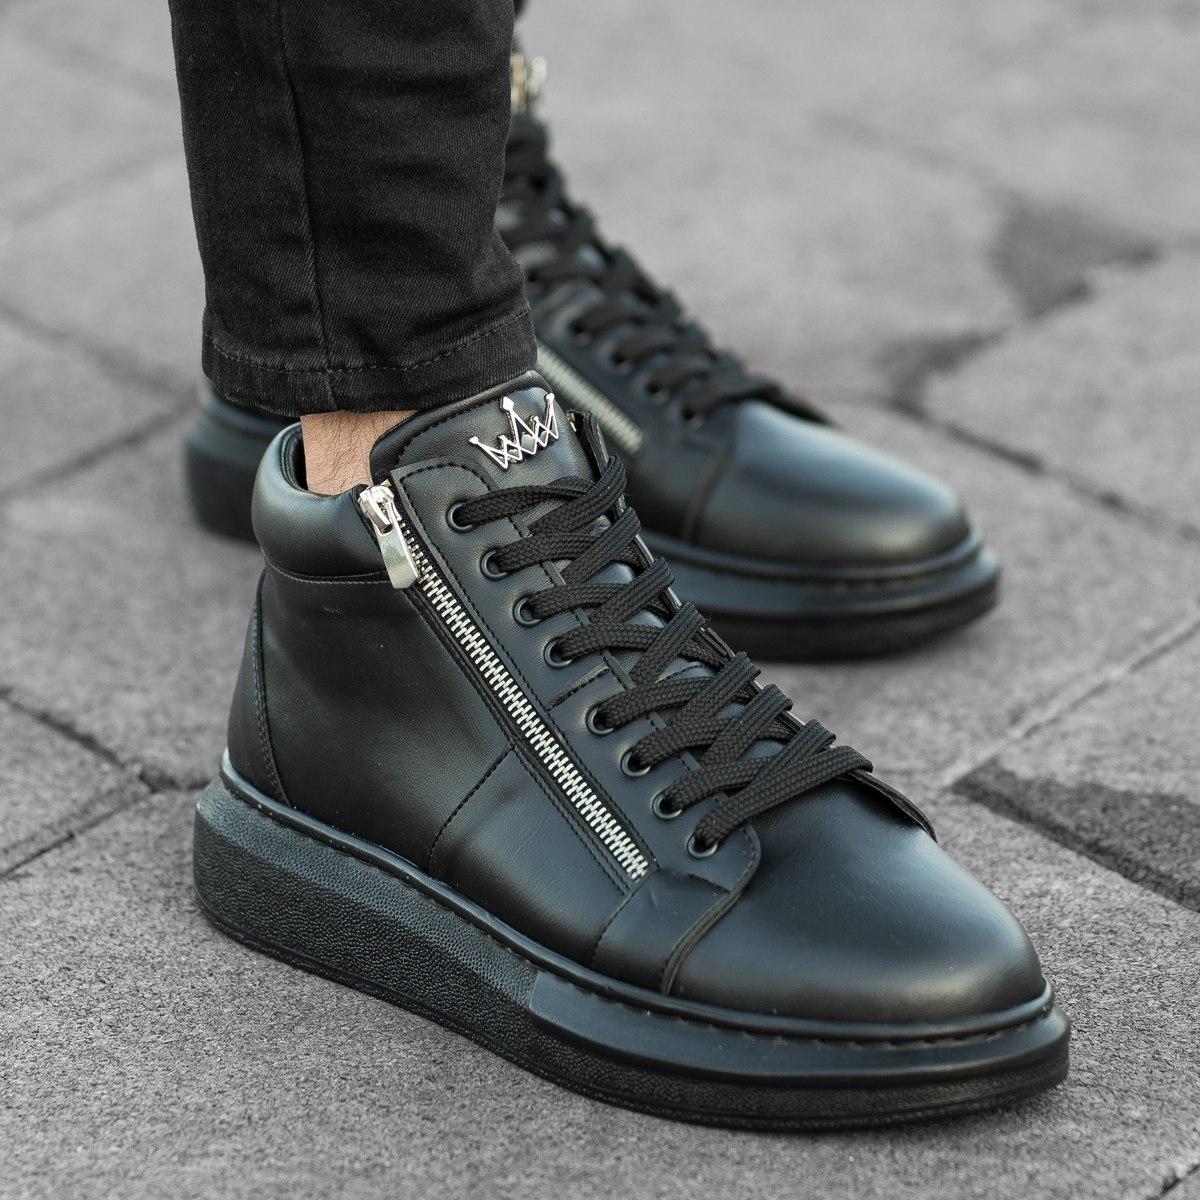 Herren High Top Sneakers Designer Schuhe mit Reißverschluss in schwarz